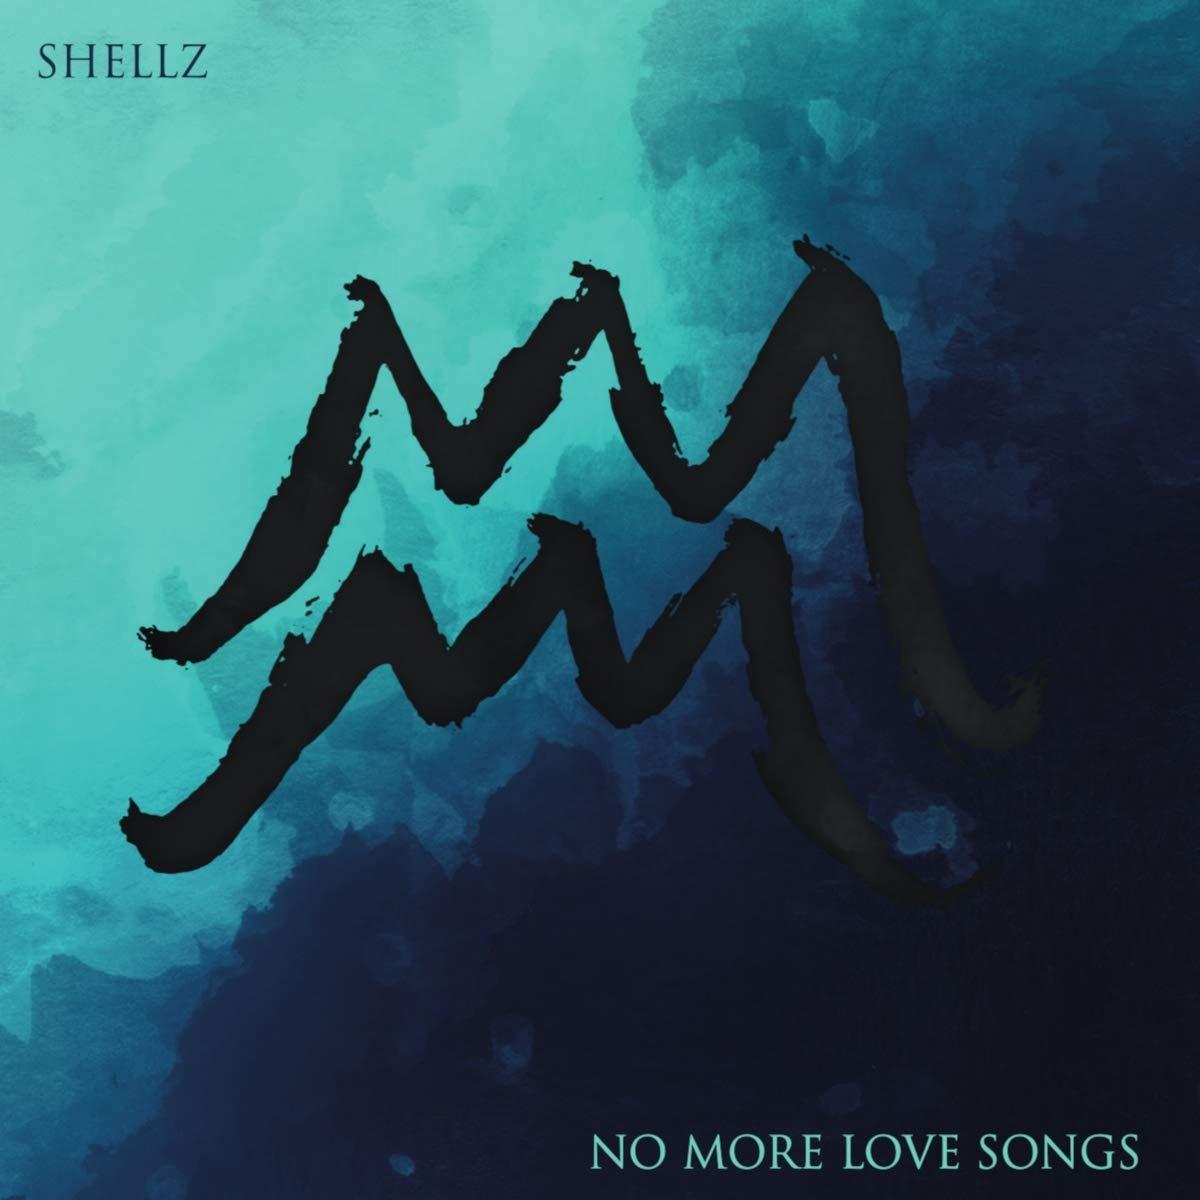 Shellz - No More Love Songs Albumcover